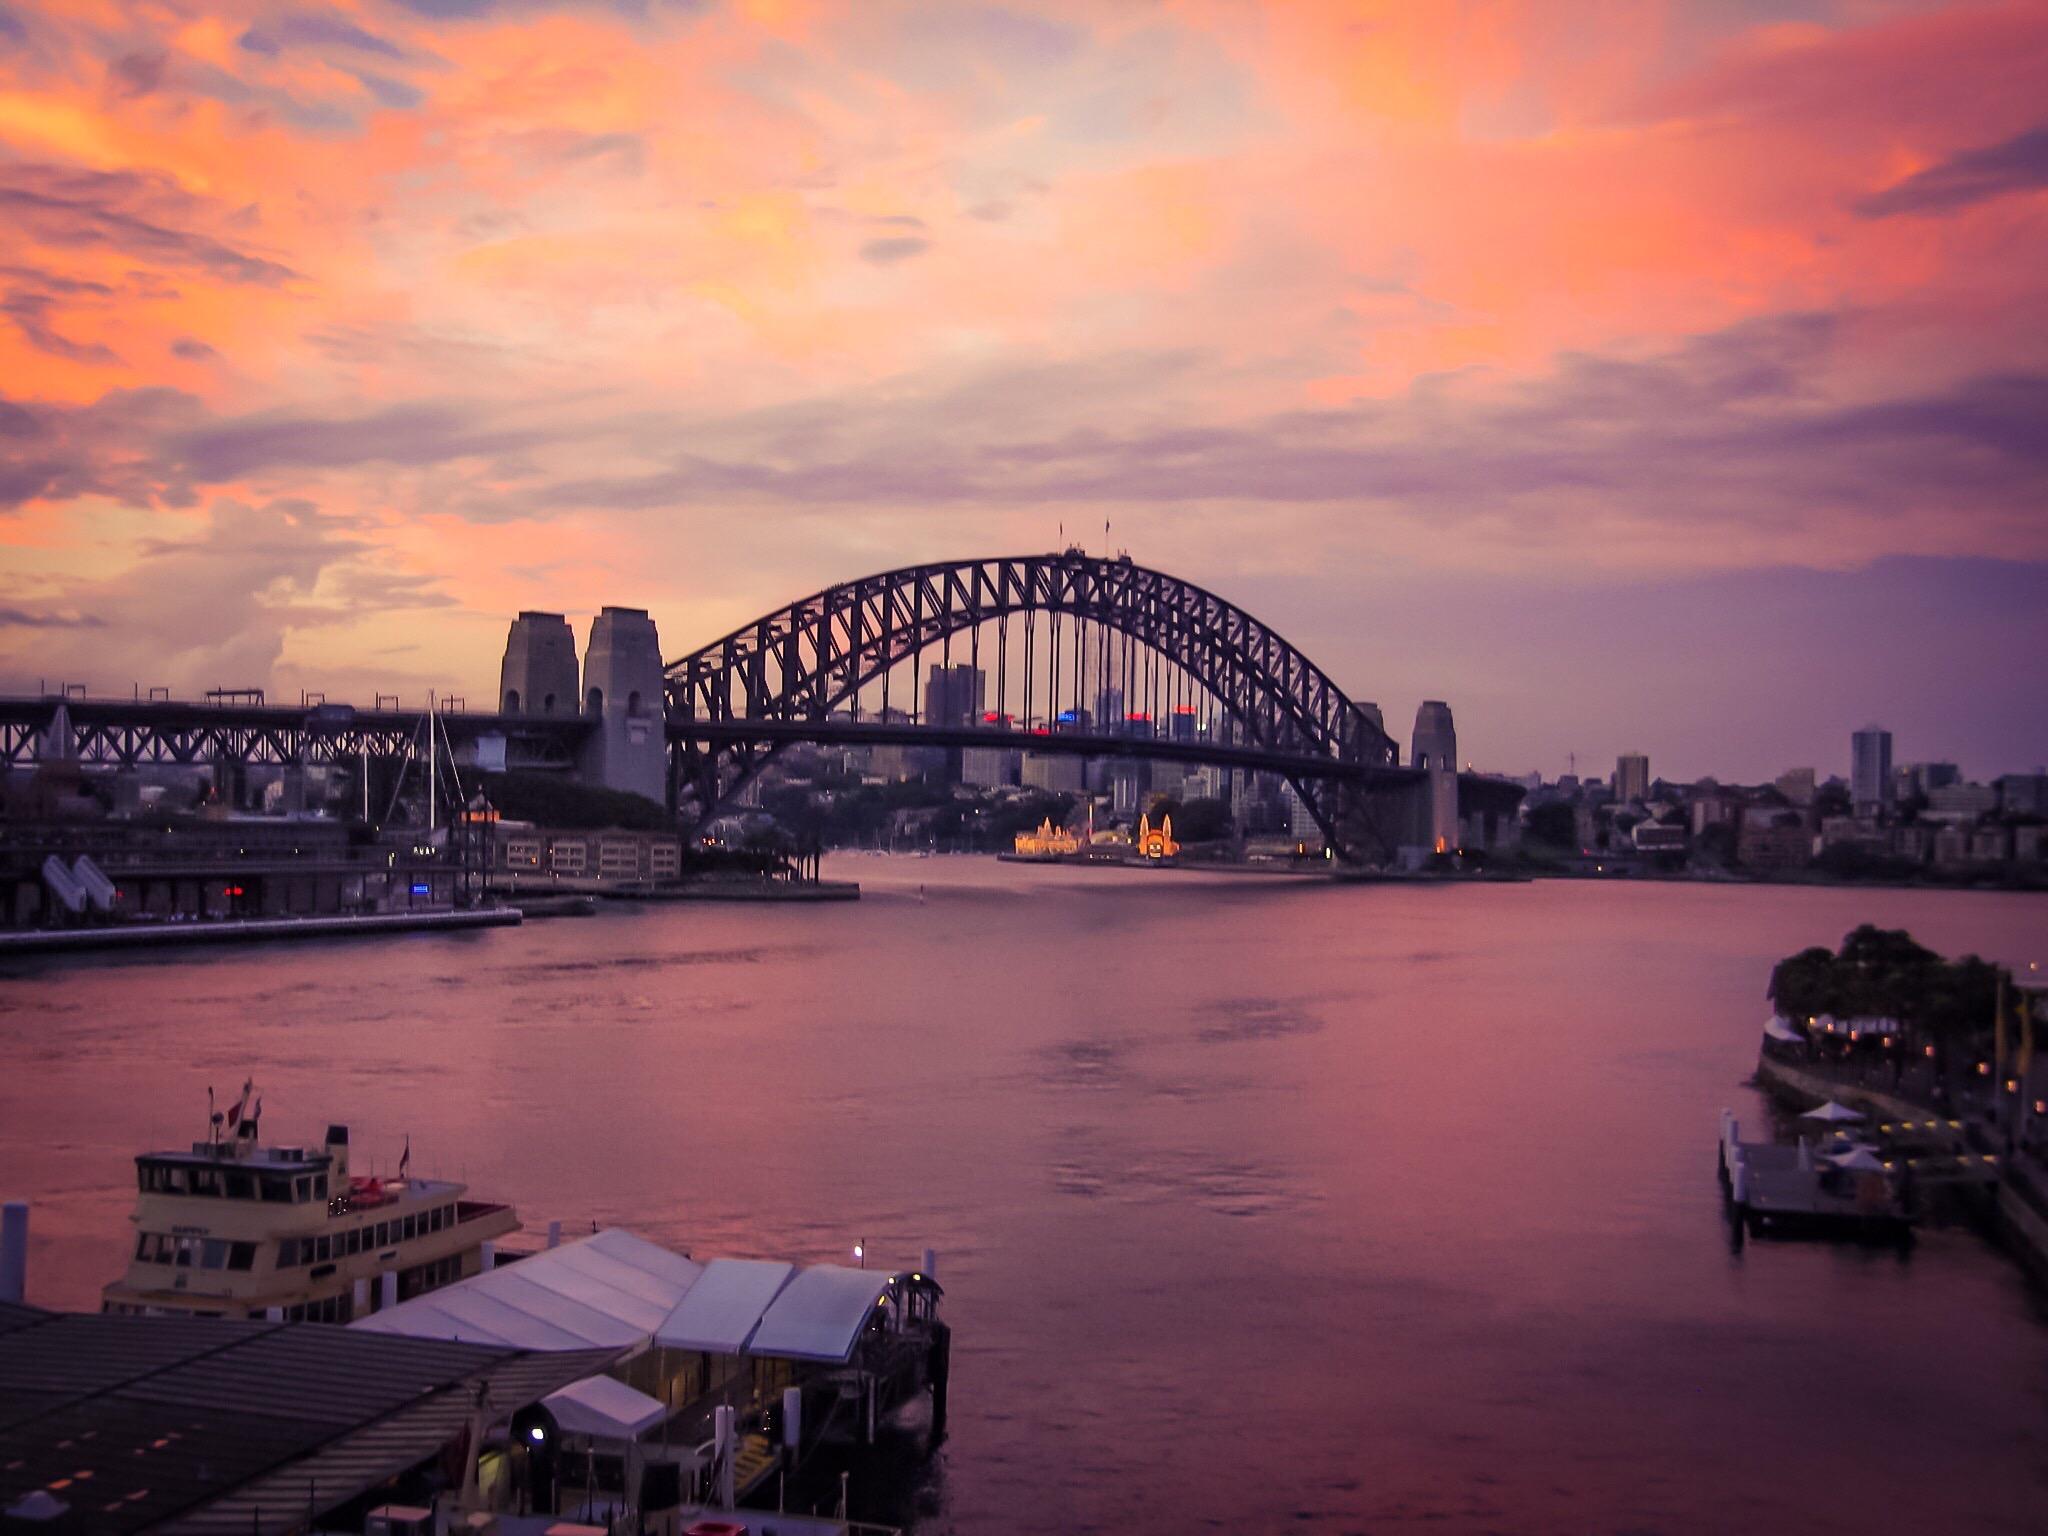 Sydney Harbour Bridge, Jan 2006. Camera: Canon S80 (compact)